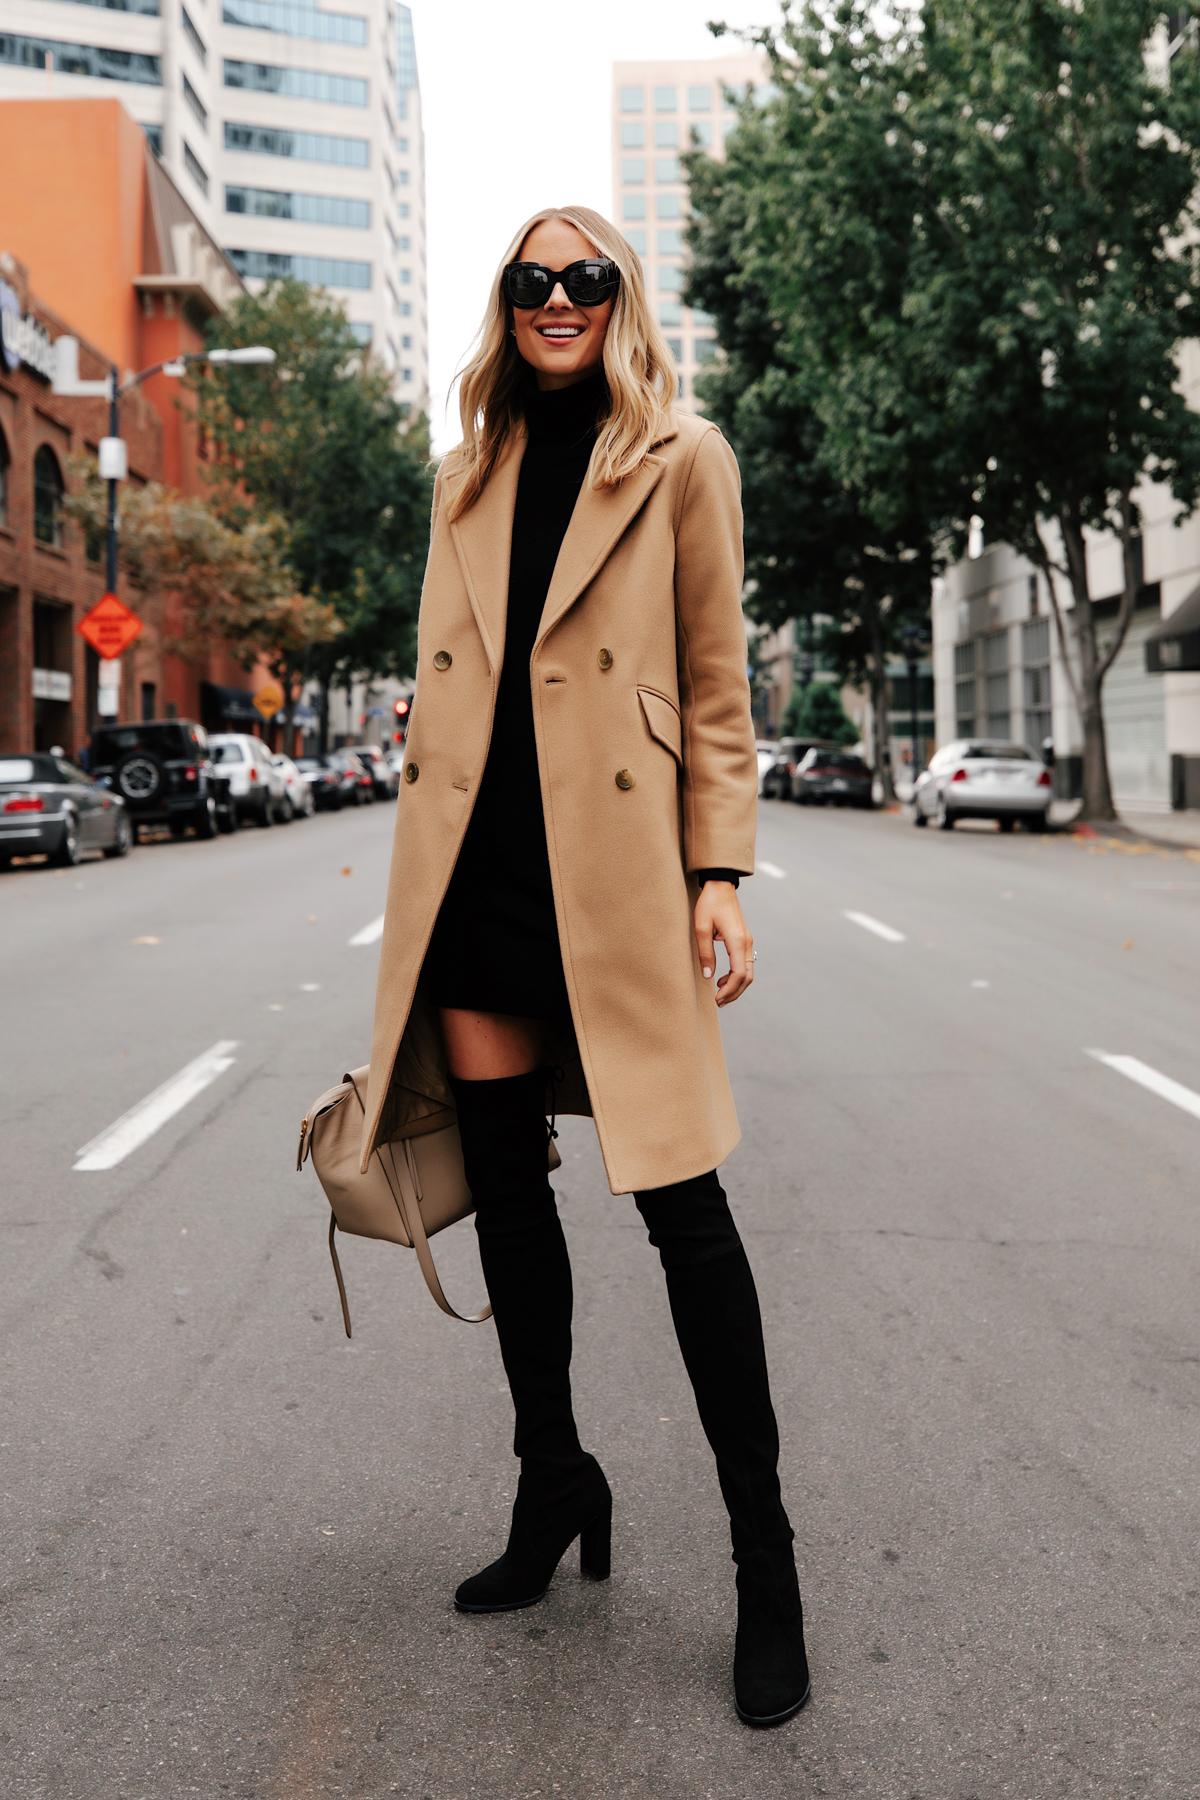 Fashion Jackson Wearing Everlane Camel Coat Everlane Black Sweater Dress Black Over the Knee Boots